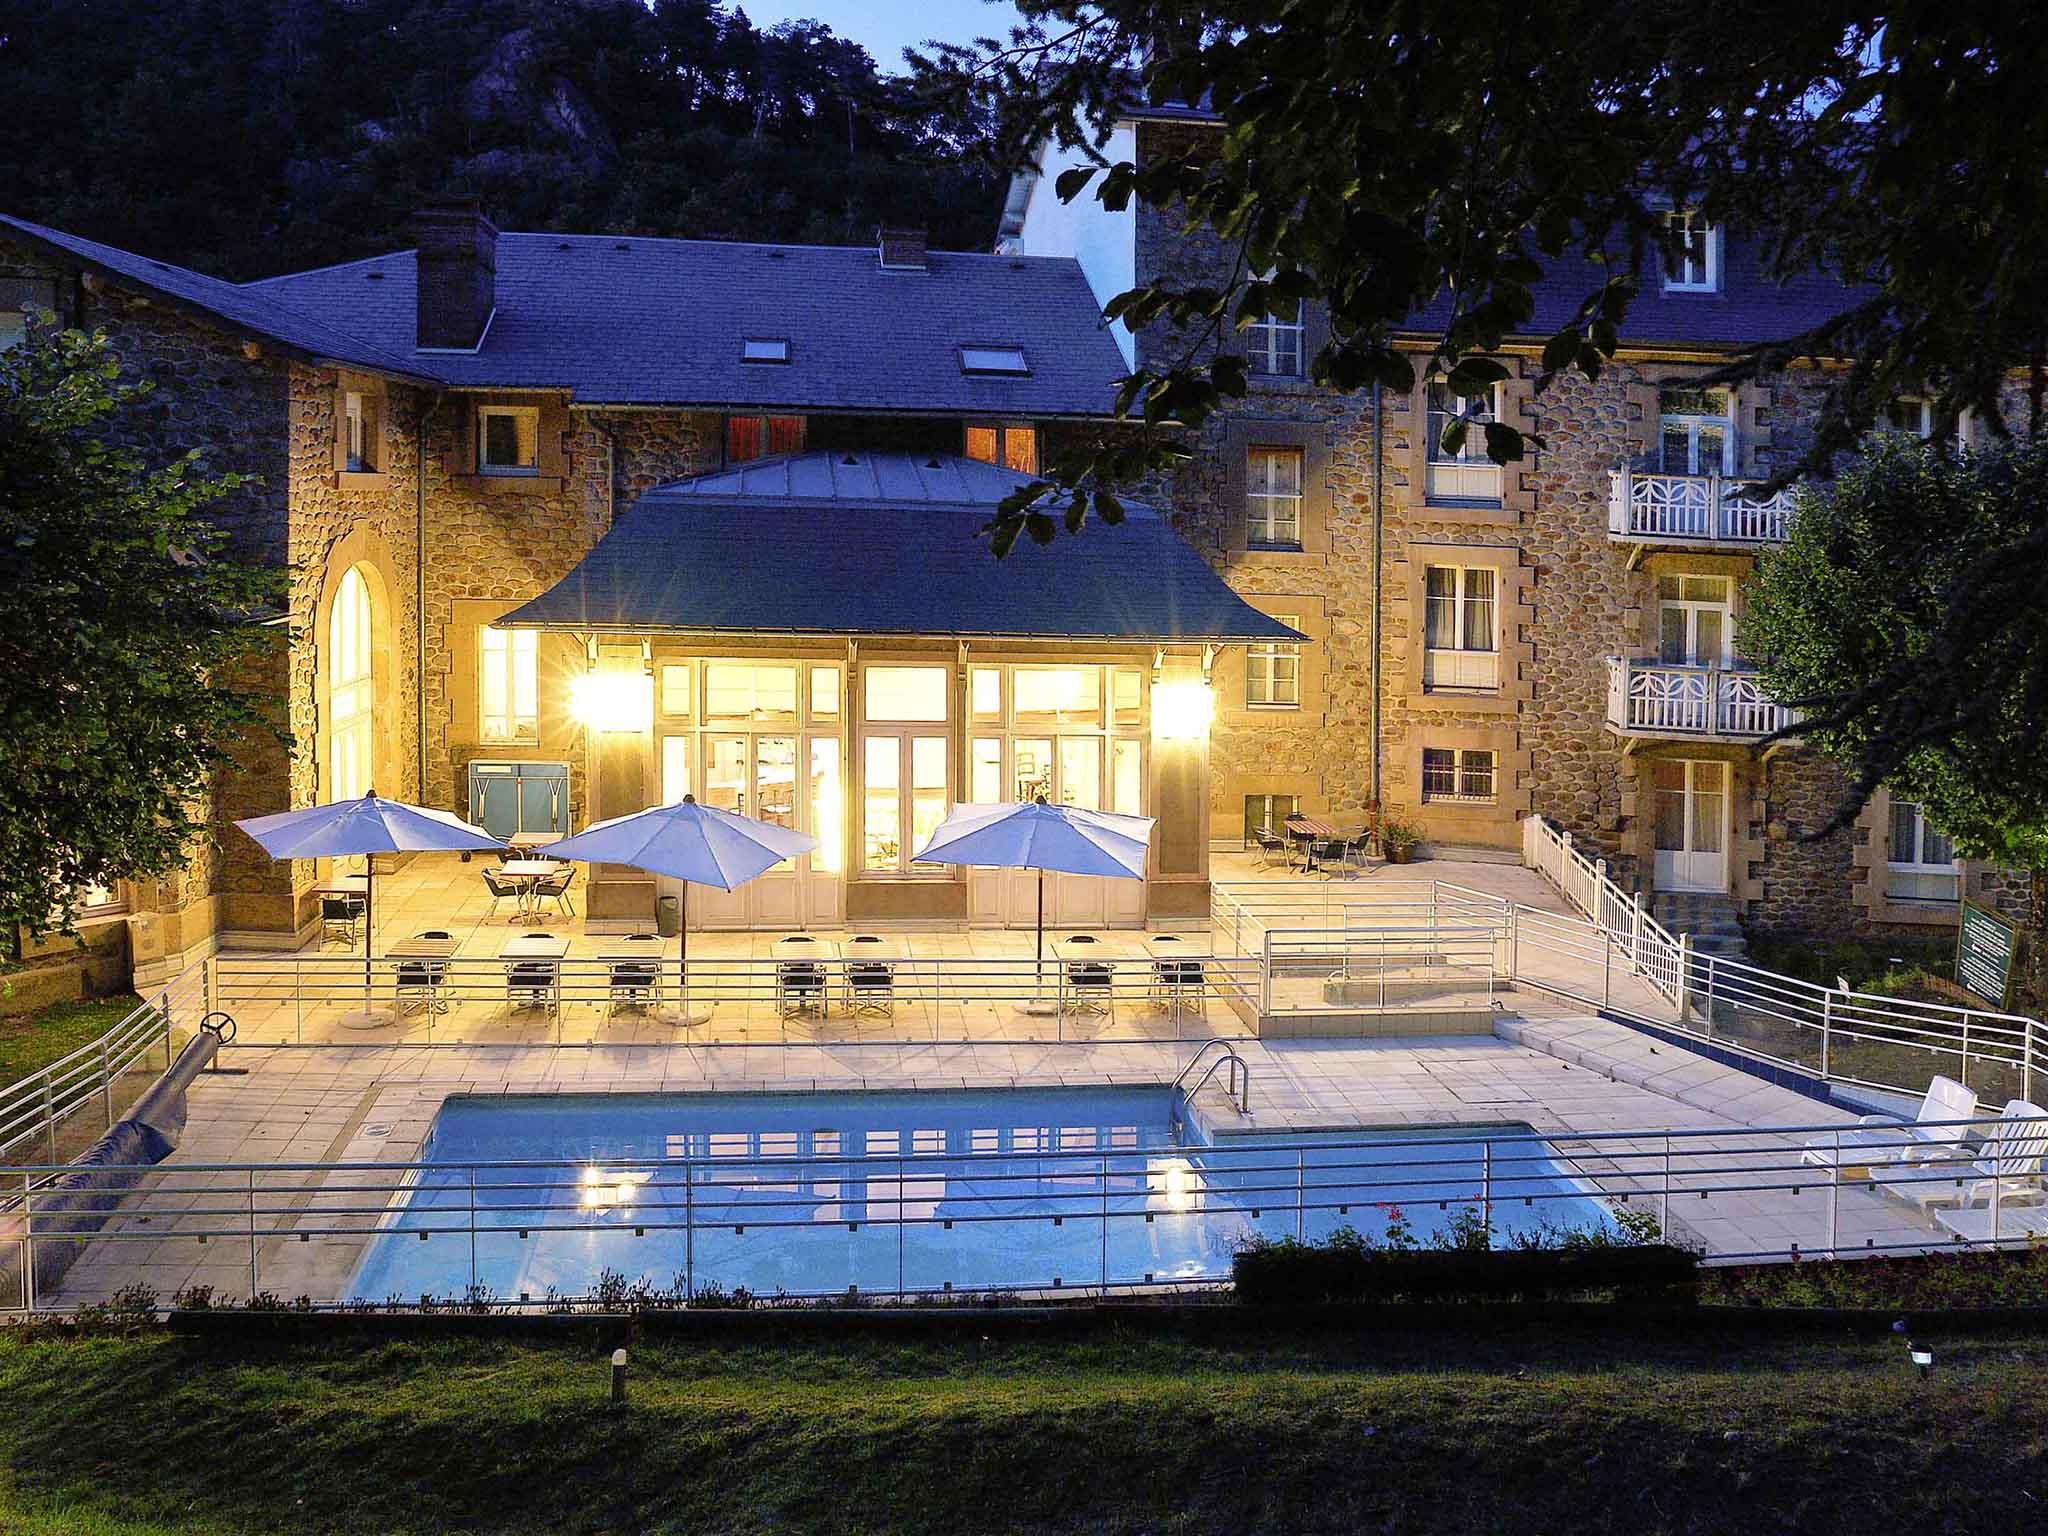 ホテル – Hôtel Mercure Saint-Nectaire Spa & Bien-Être